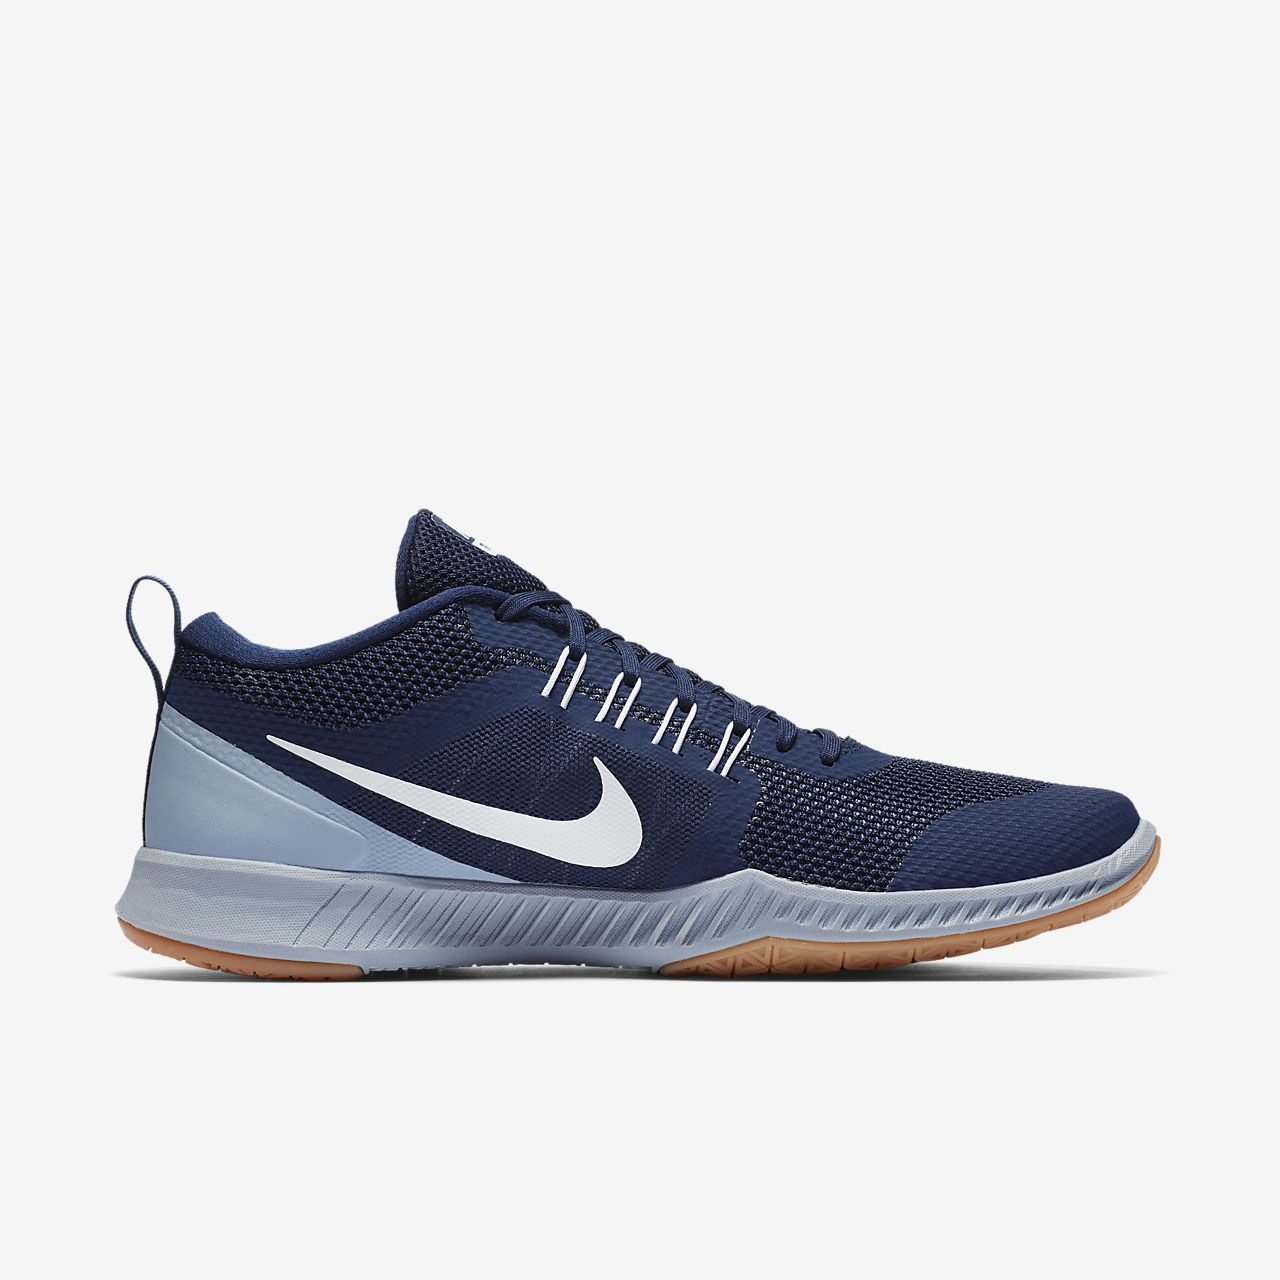 6fe672f2b3324 Nike Zoom Domination Men s Training Shoe. Nike.com GB